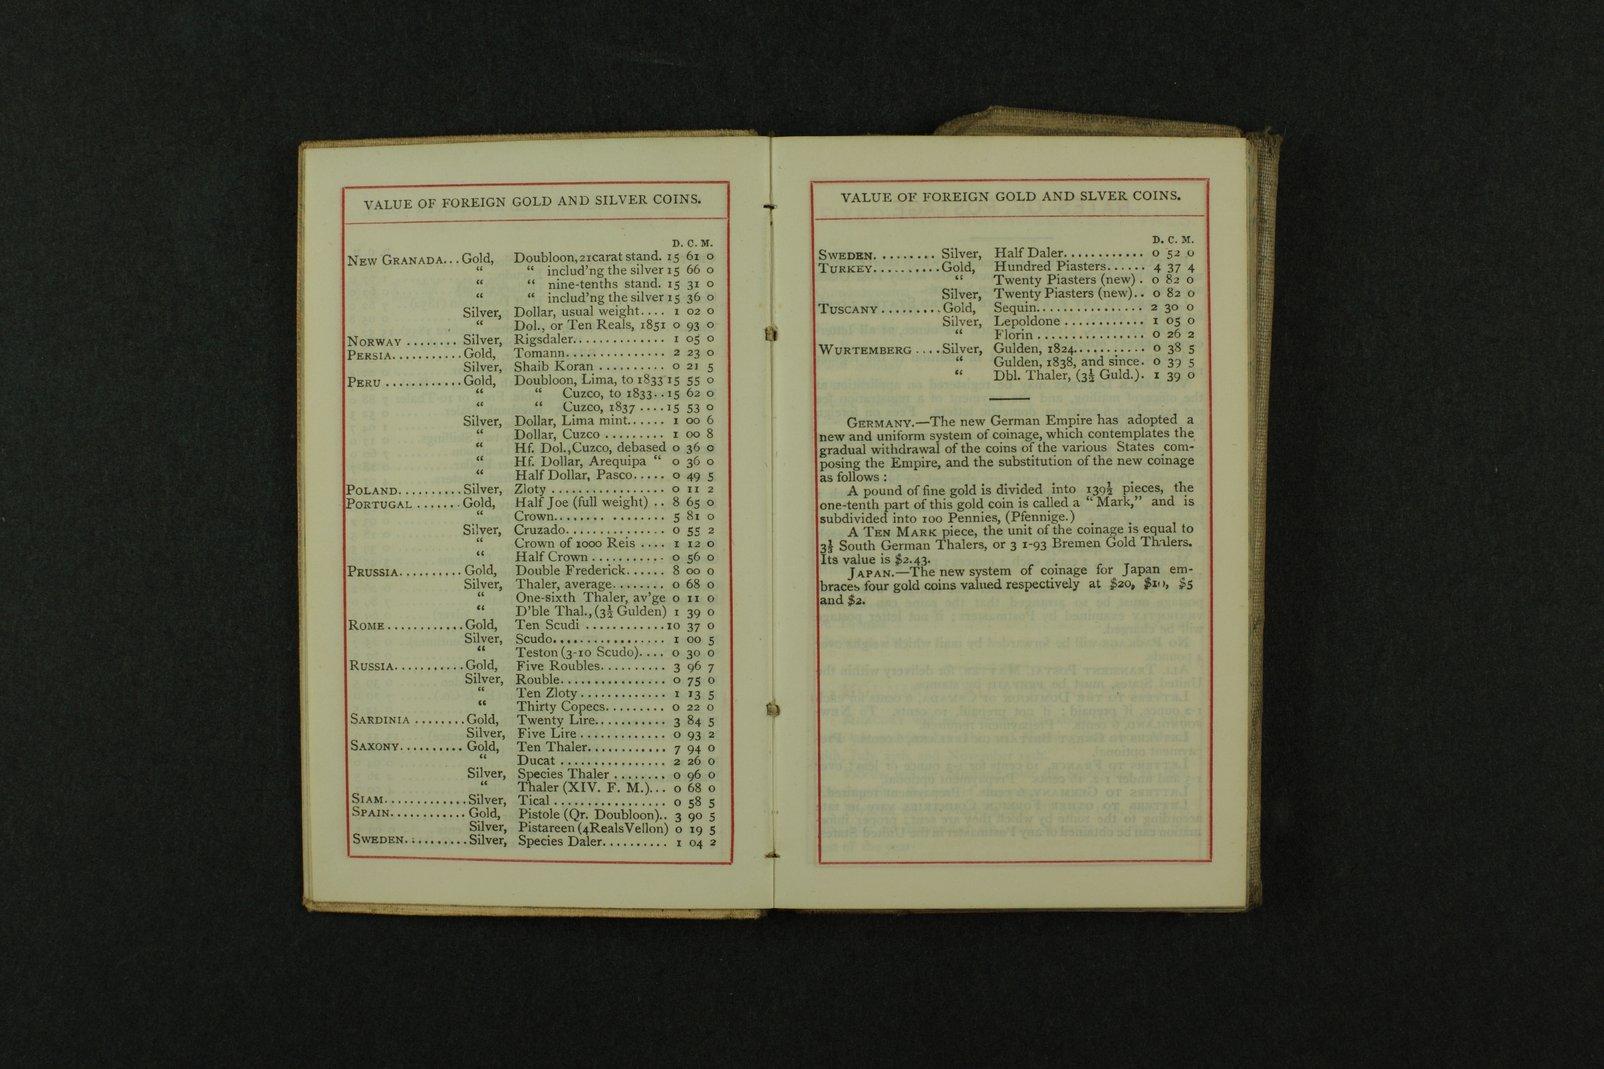 William E. Goodnow diary - 8